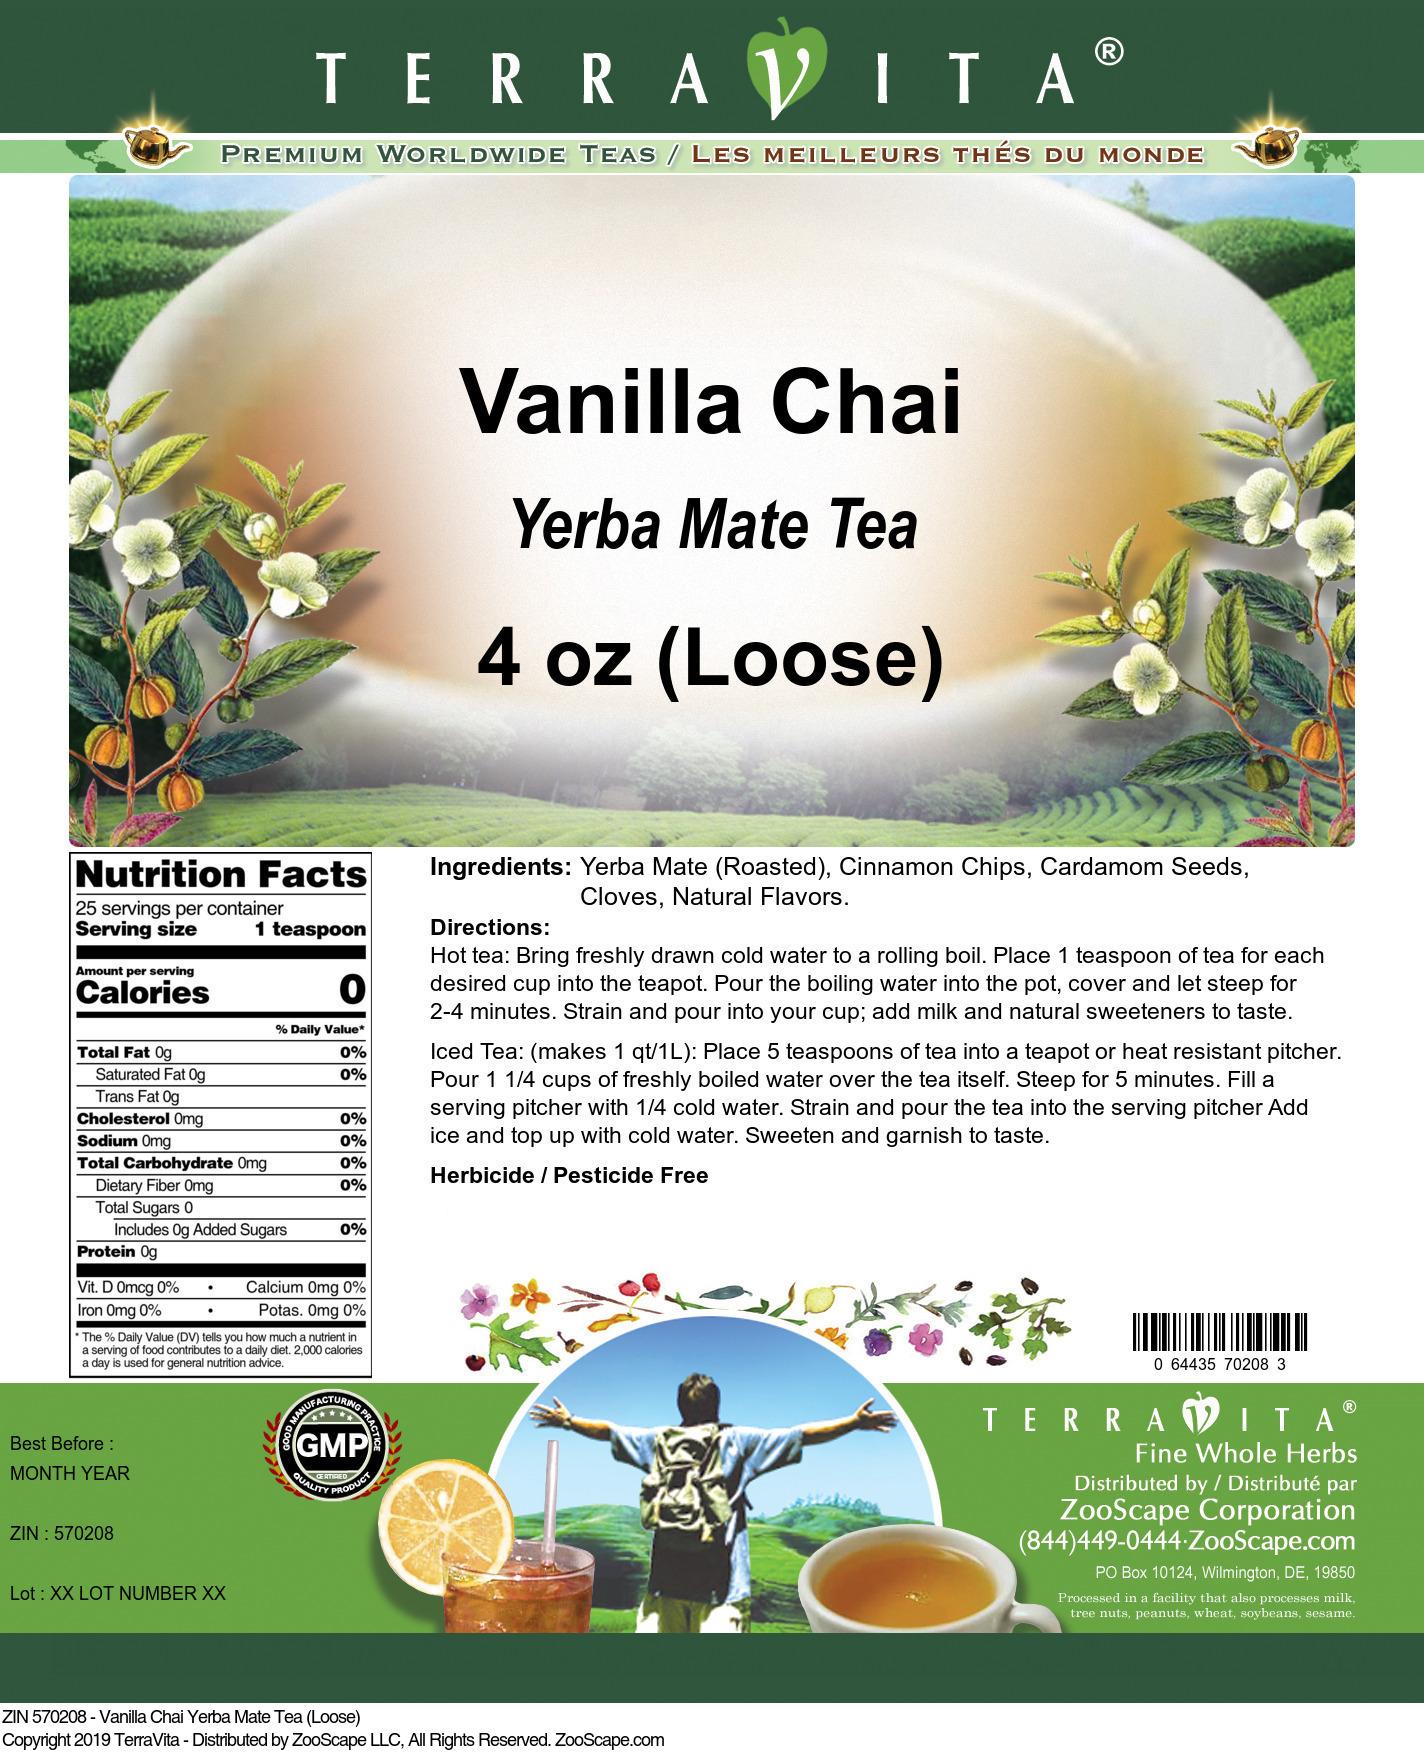 Vanilla Chai Yerba Mate Tea (Loose)